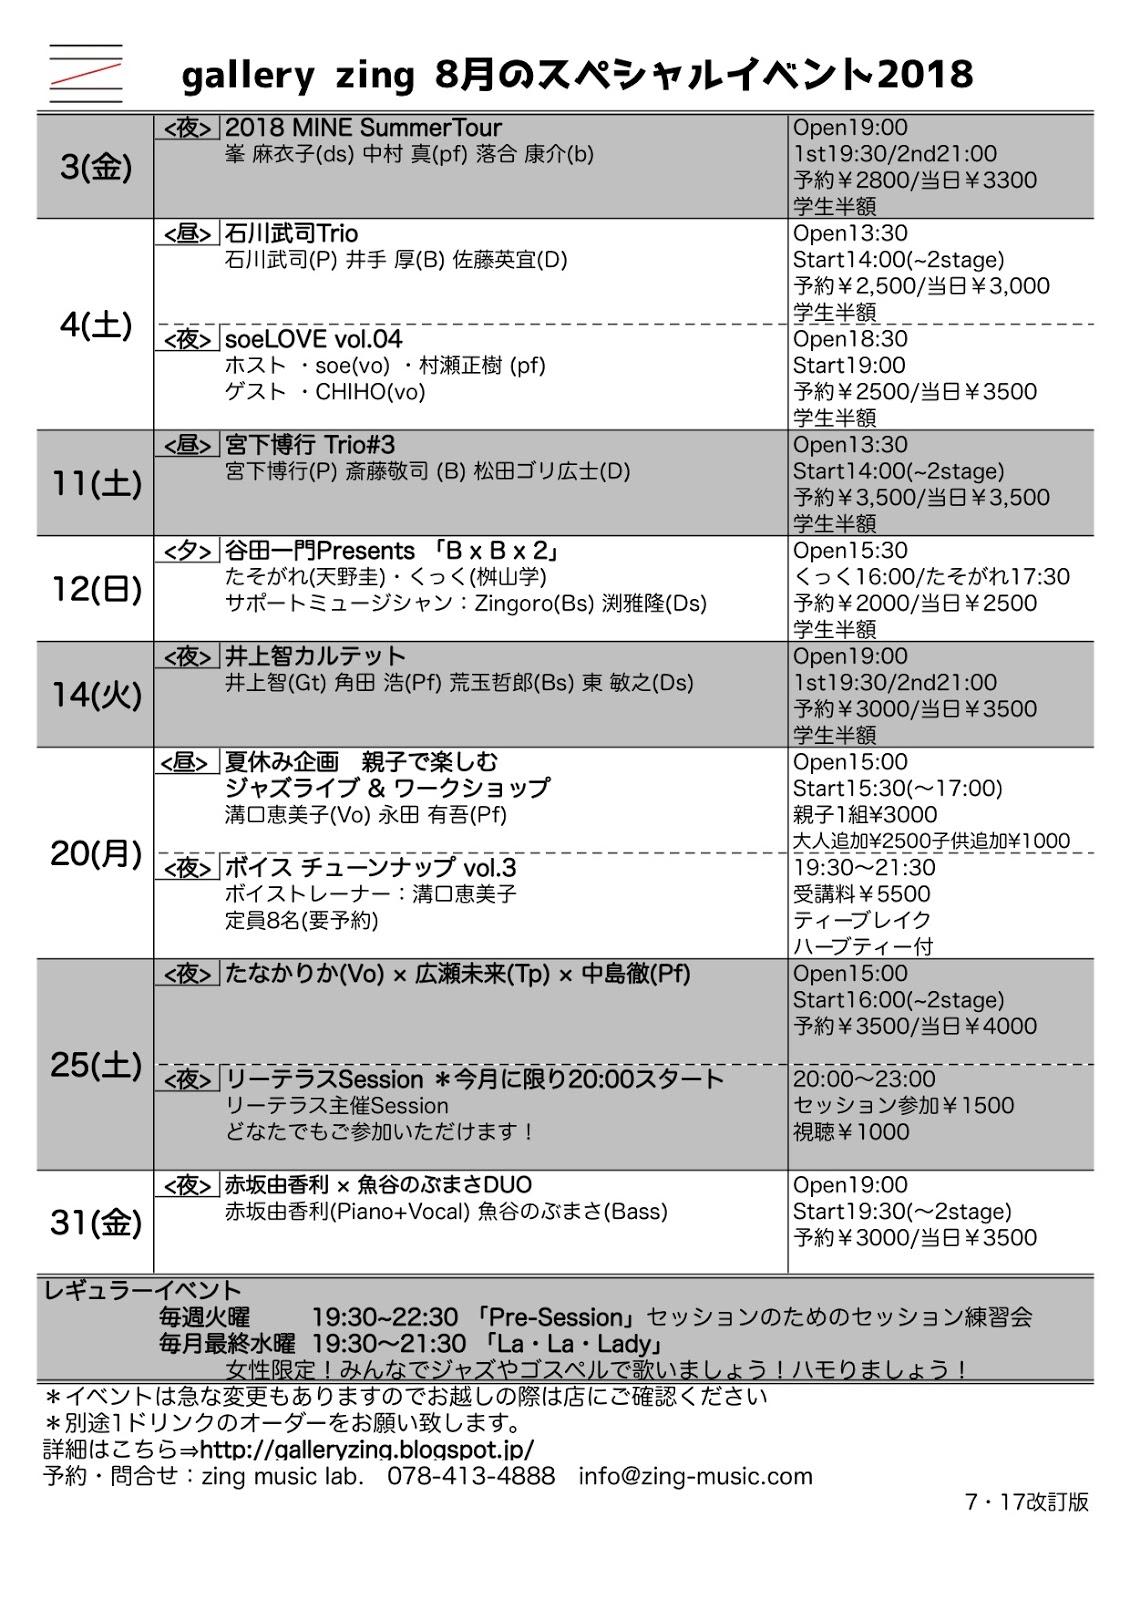 gallery zing schedule 2018年 8月のスケジュール